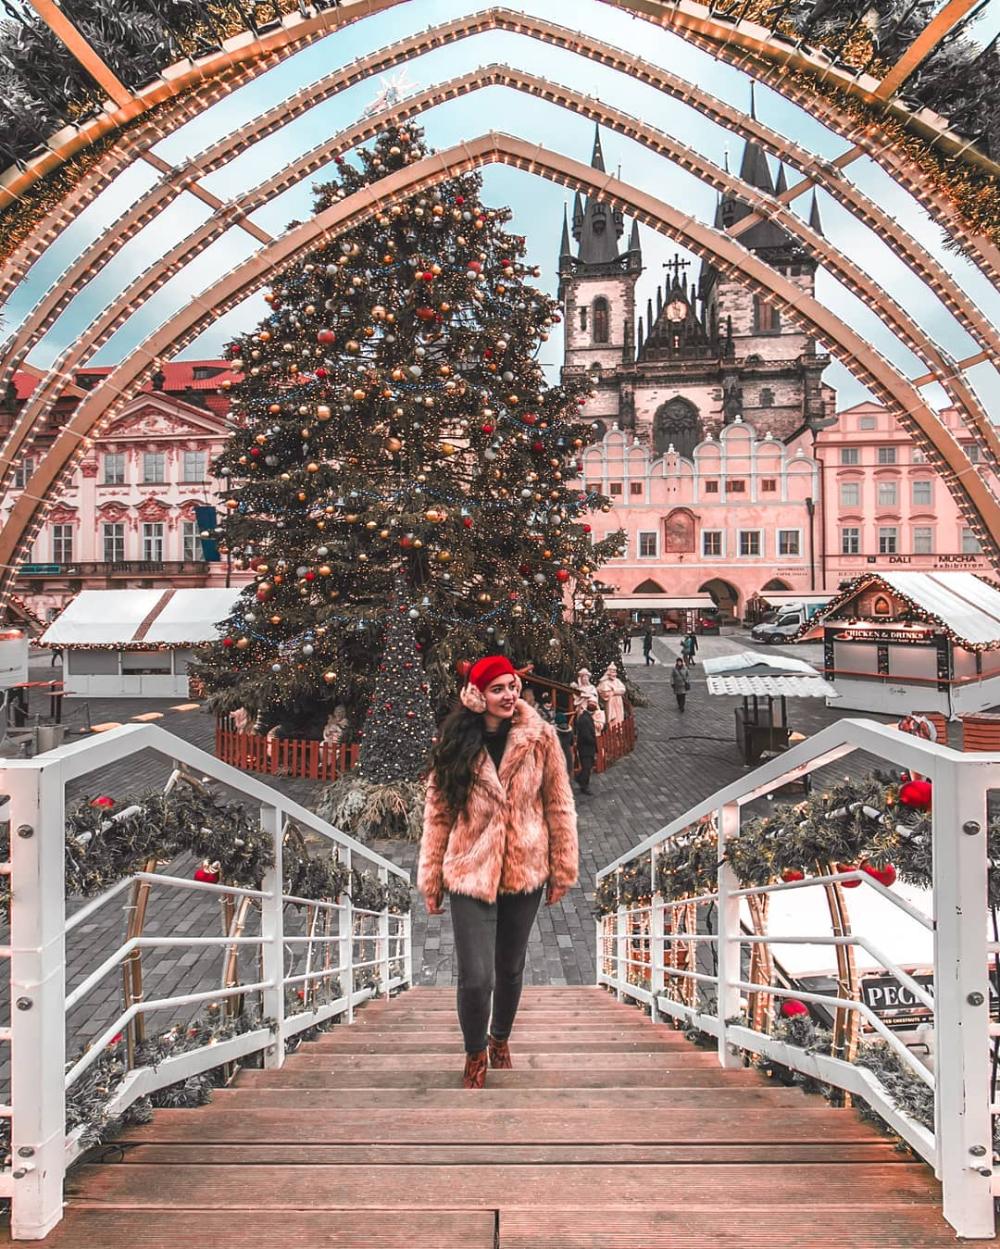 Alexane Thetravellingfrenchy Prague Czech Republic Instagram Spot Prague Czechia Czechrepublic In 2020 Prague Christmas Market Prague Christmas Christmas Market